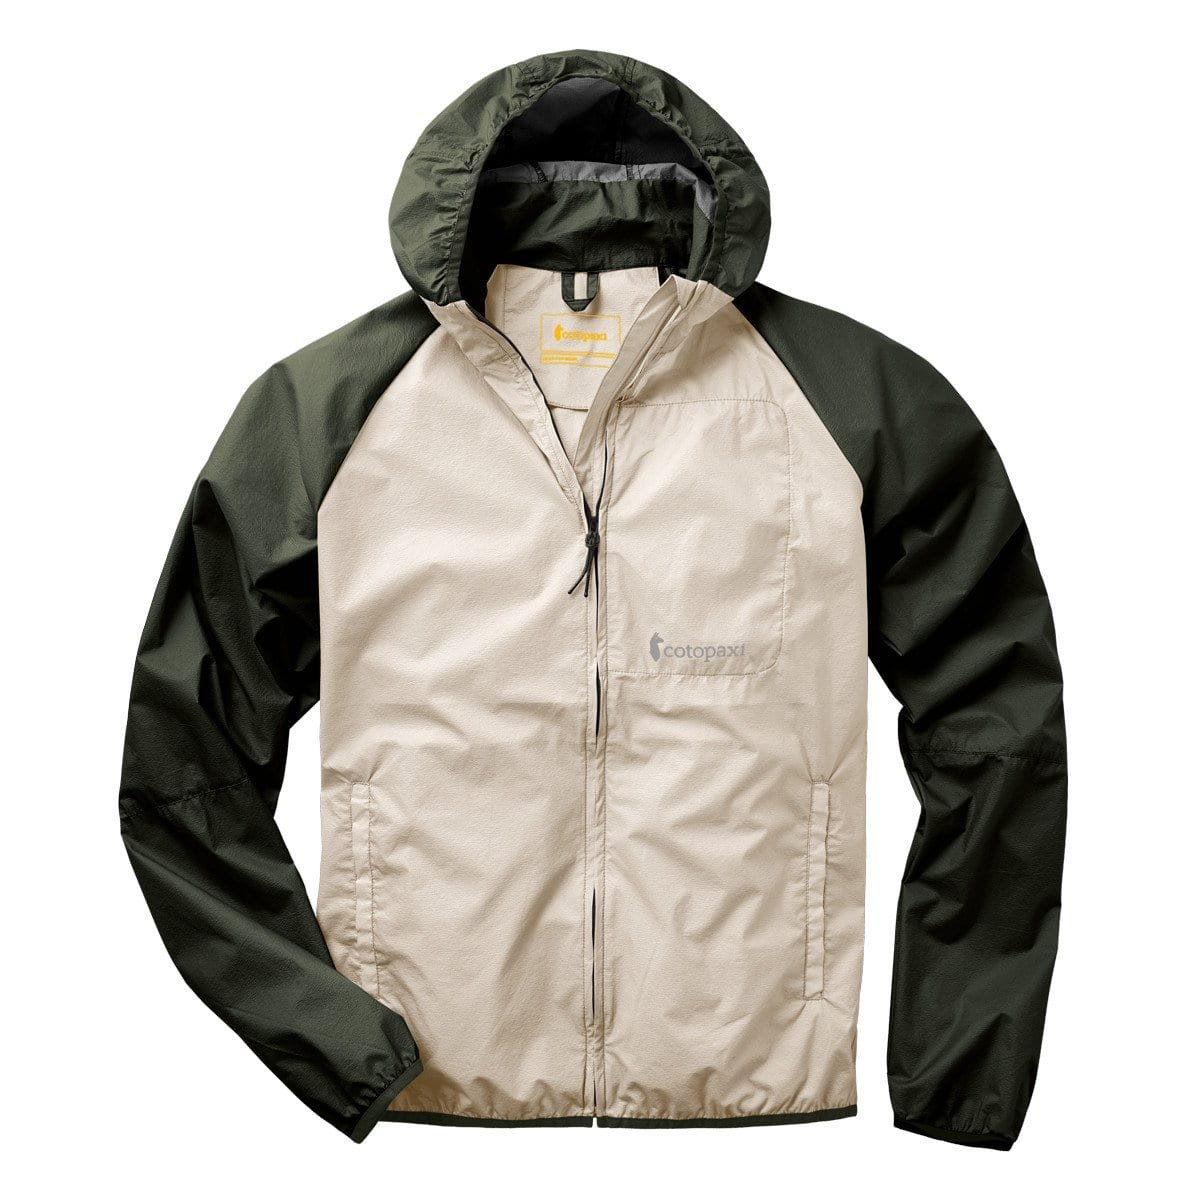 Cotopaxi Paray Lightweight Jacket - Men's - L/Cream/Cargo